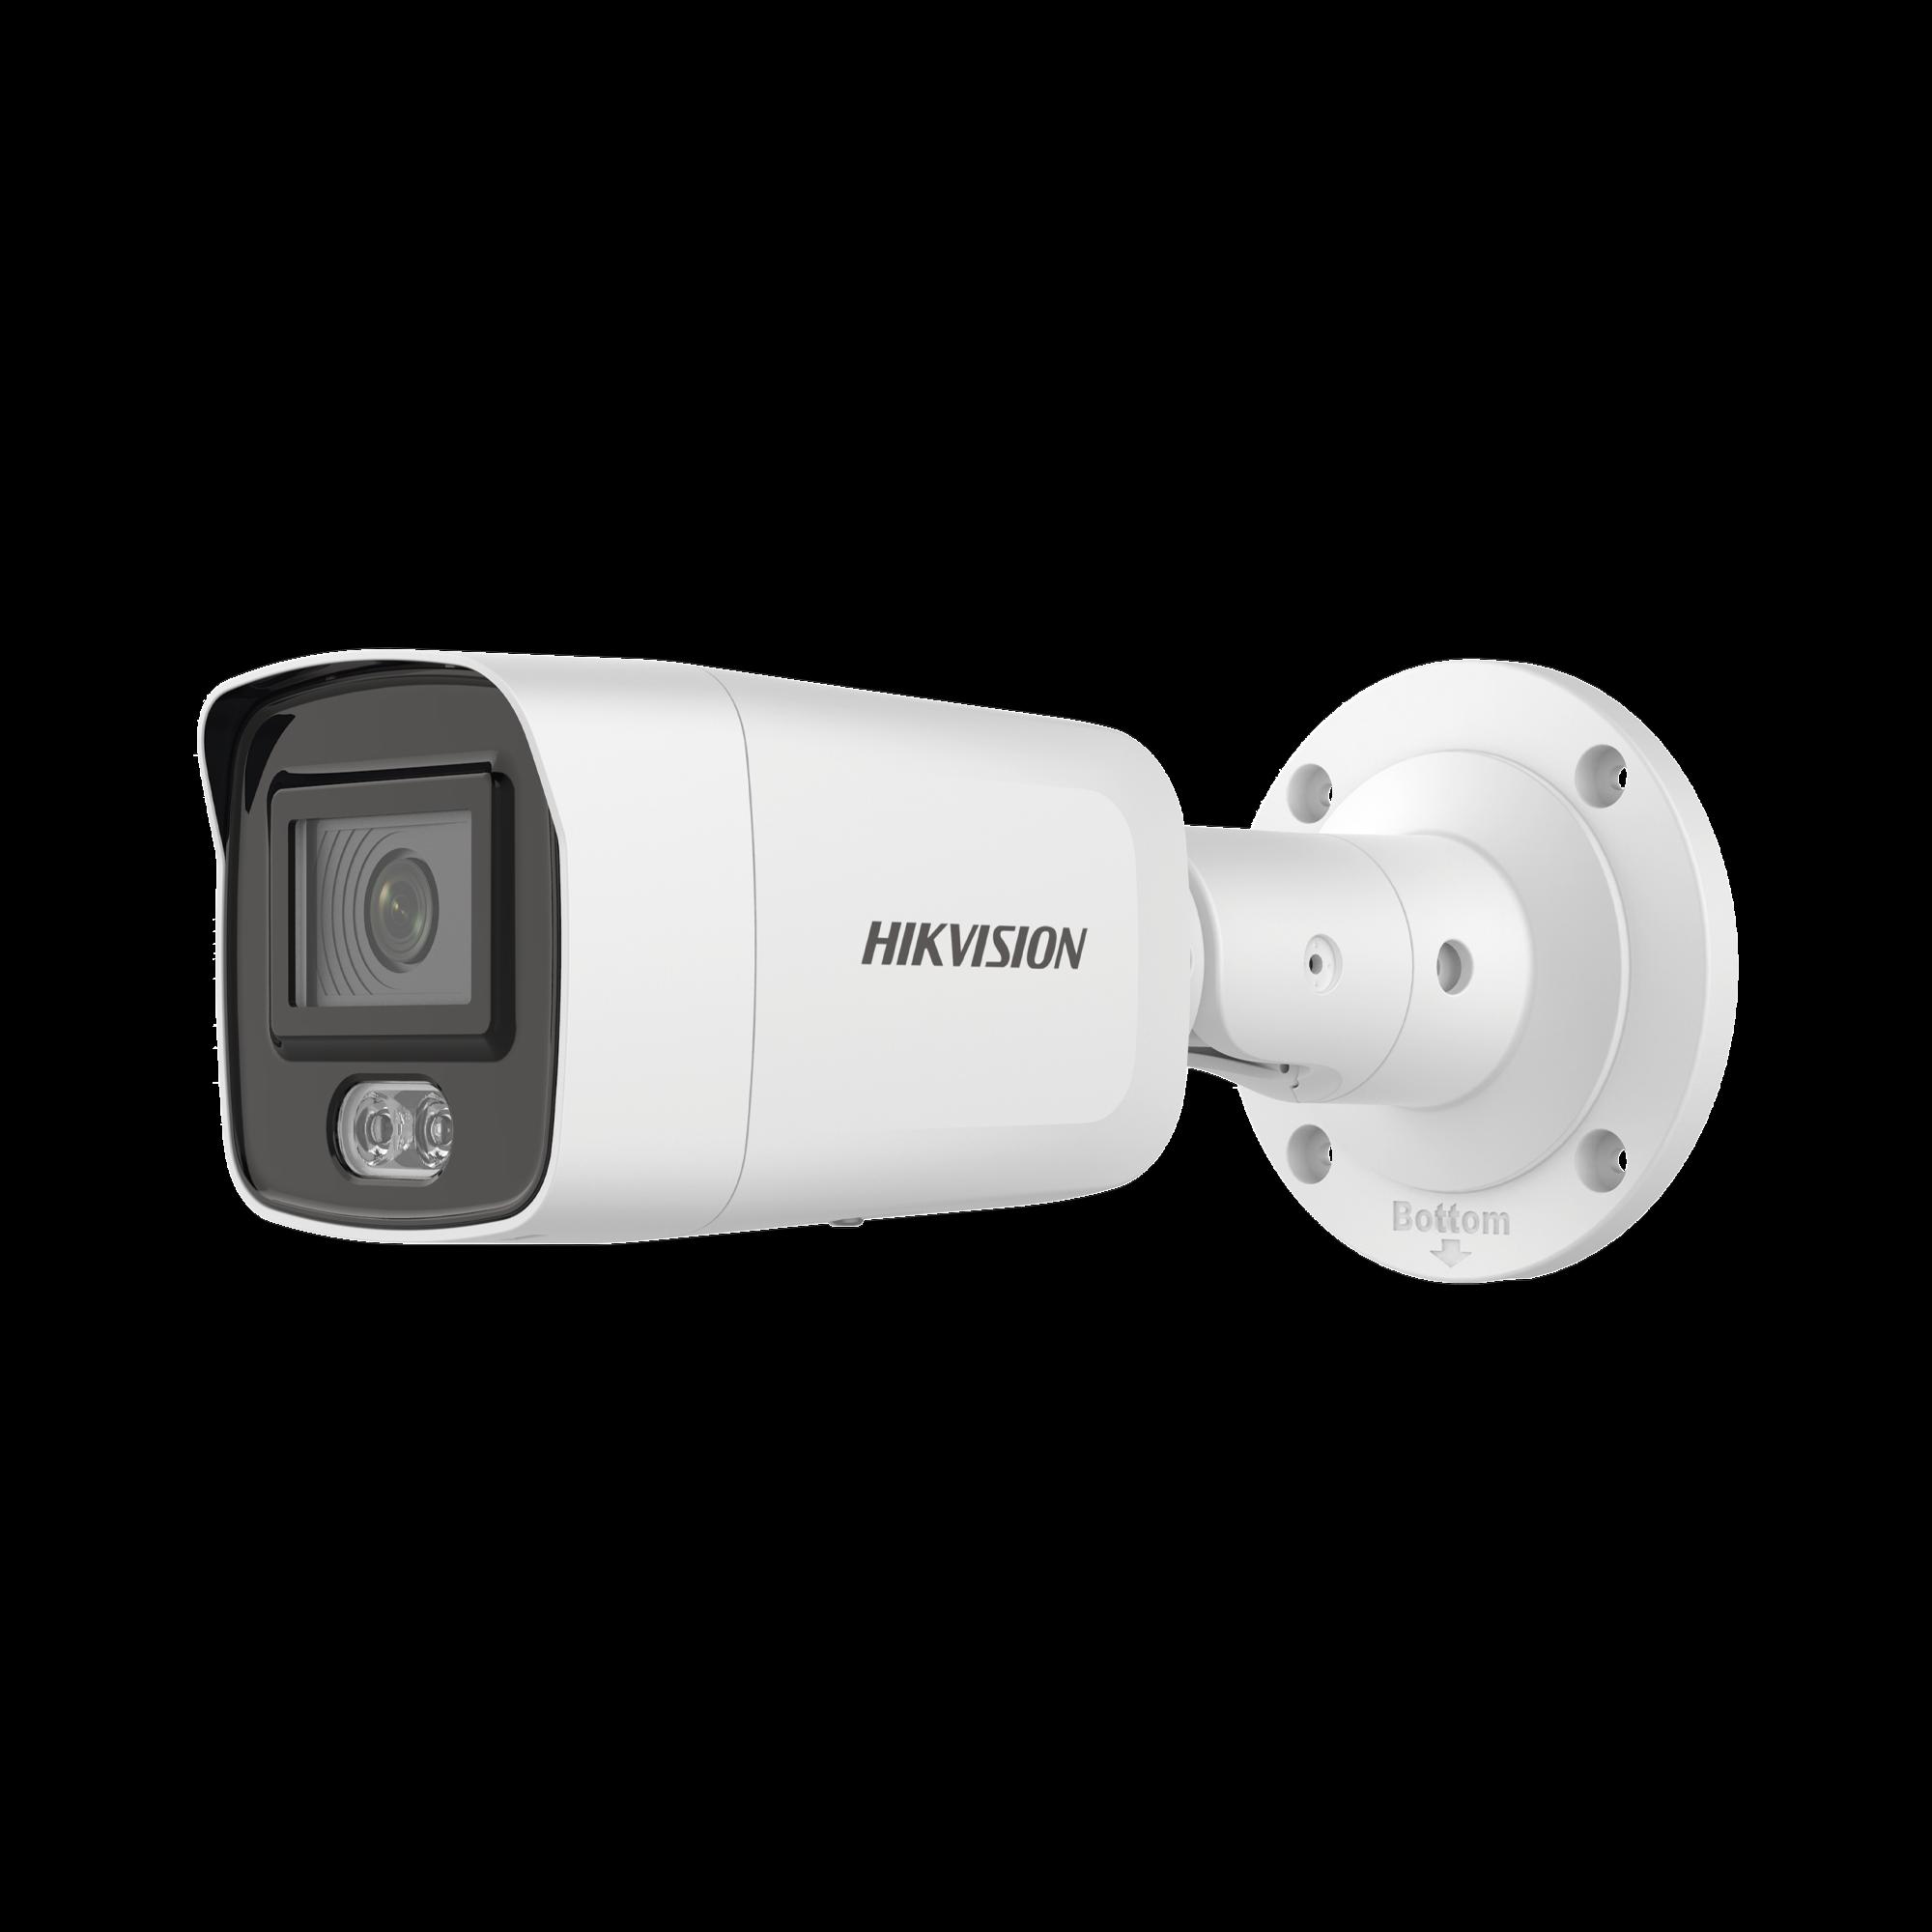 Bala IP 4 Megapixel / Imagen a color 24/7 / Lente 4 mm / Luz Blanca 40 mts / Exterior IP67 / WDR 120 dB / Audio y Alarma / Captura Facial